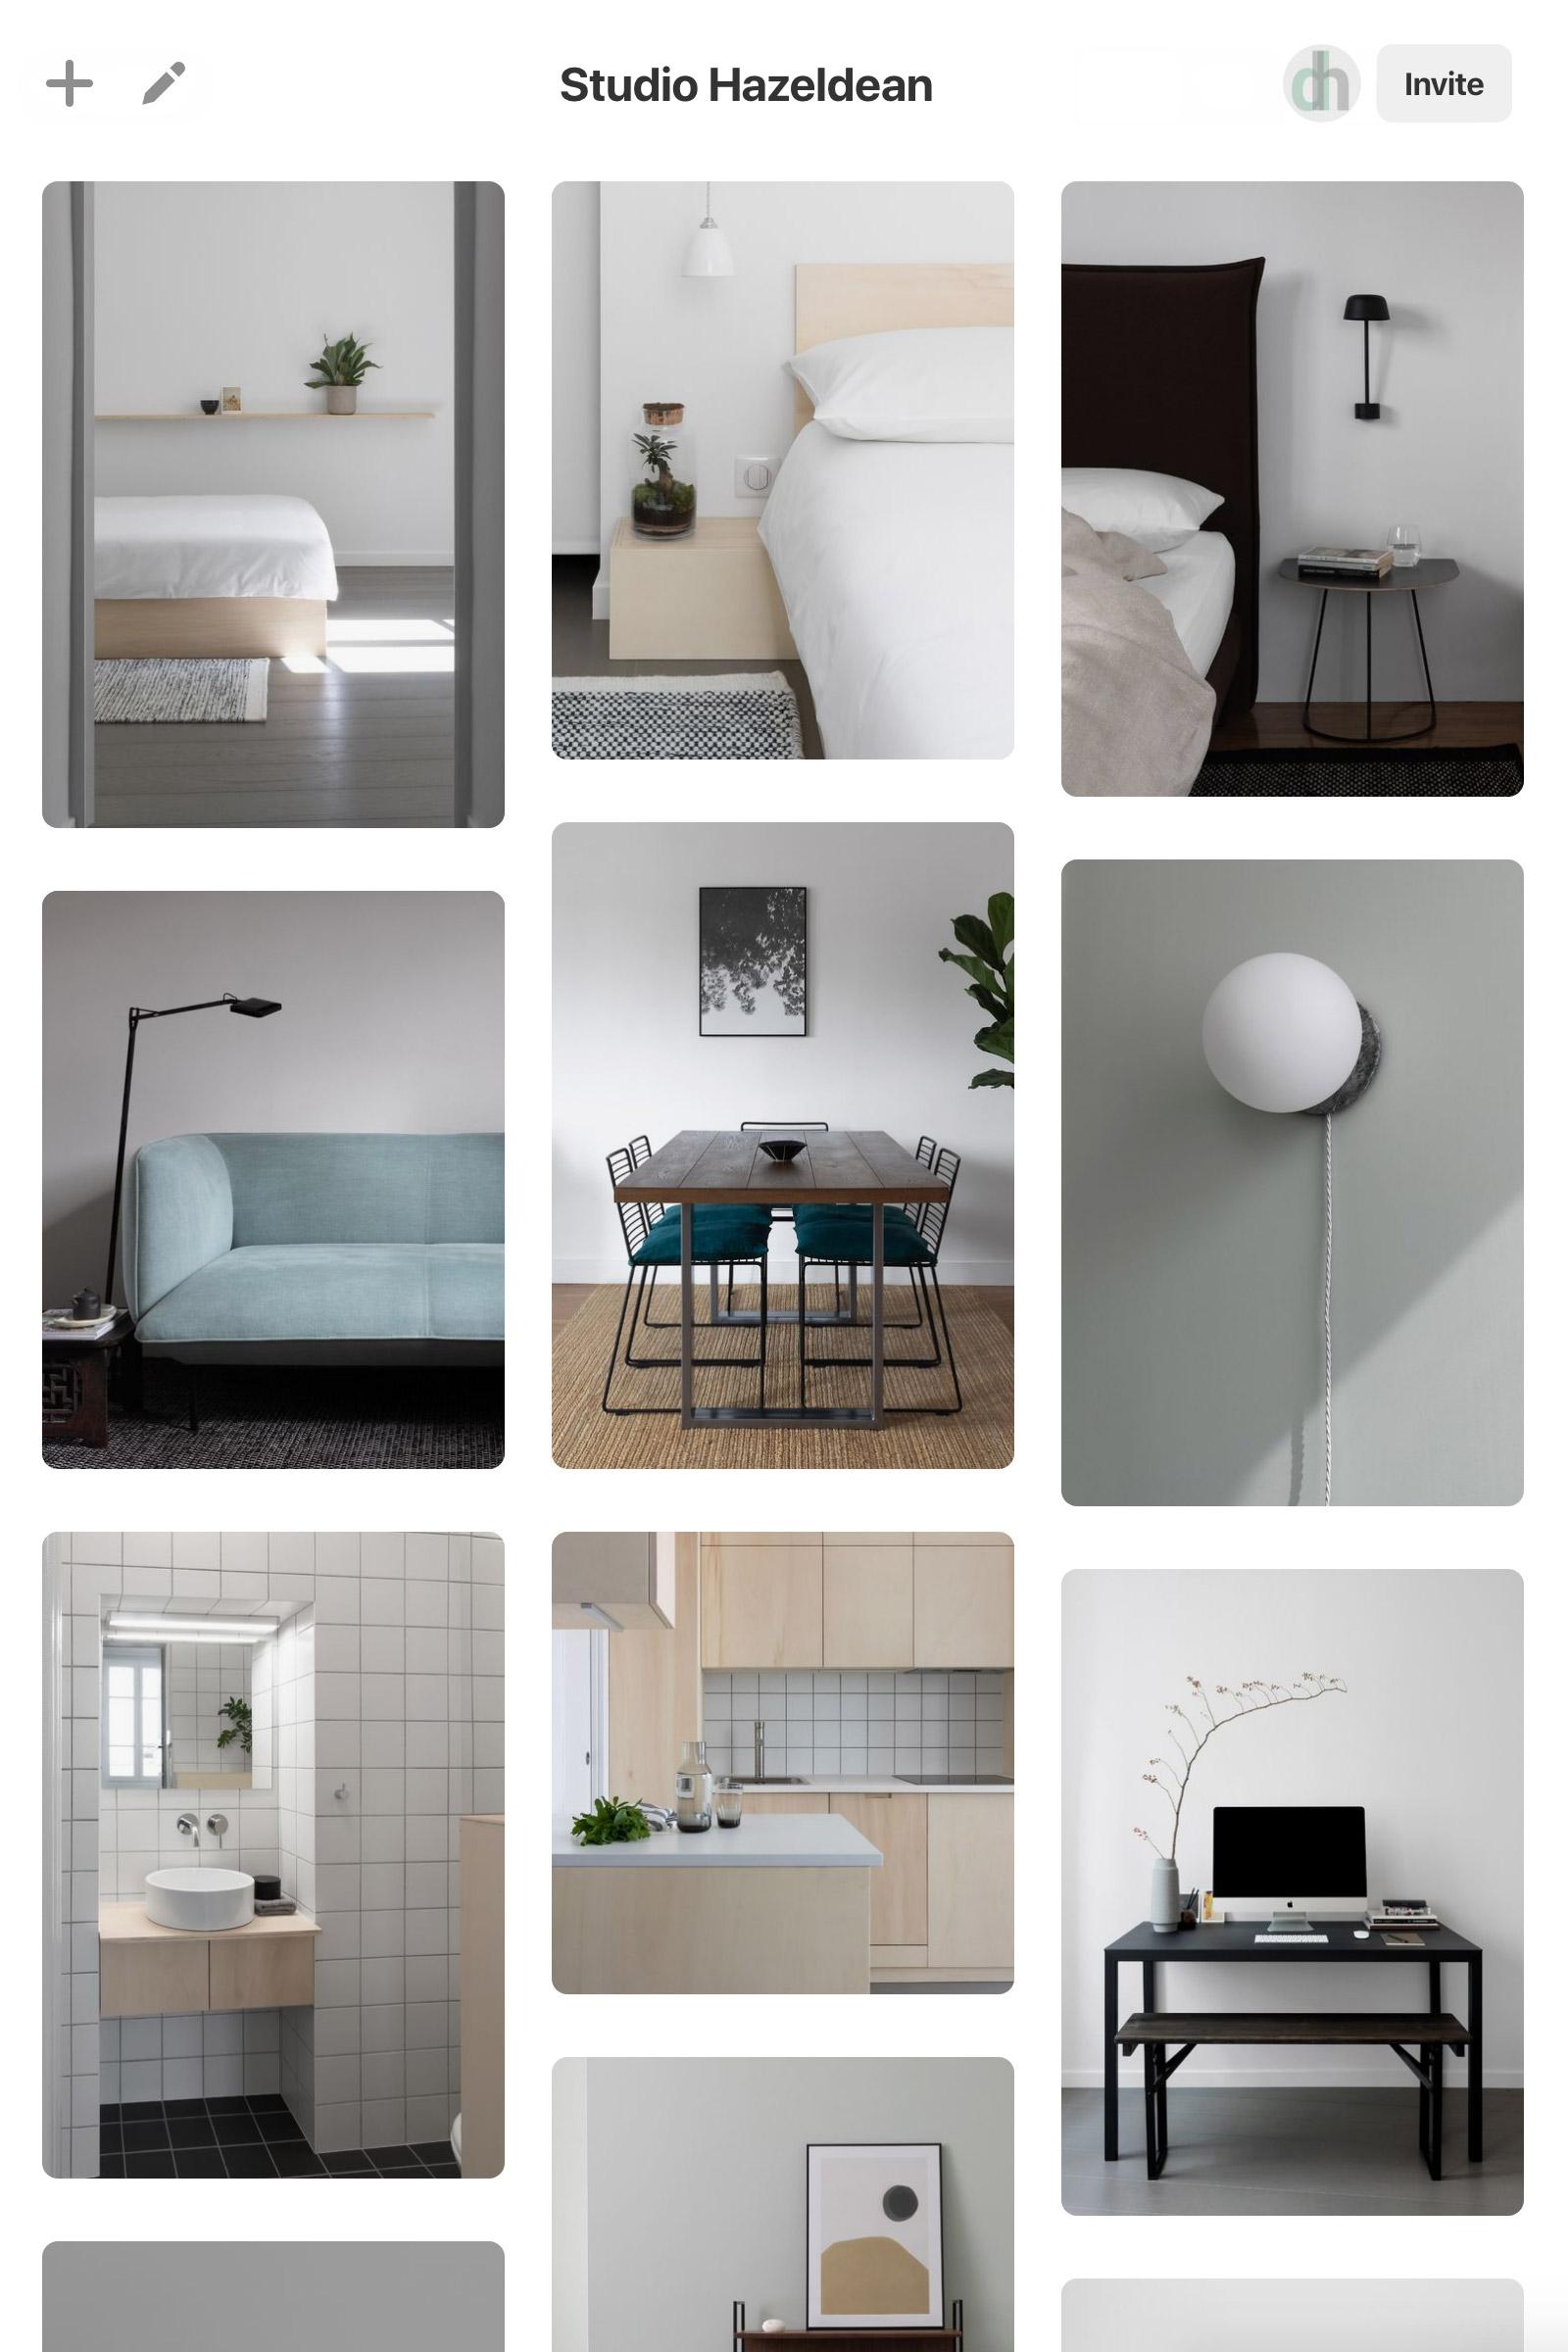 Pinterest screenshot showing board with Studio Hazeldean pins